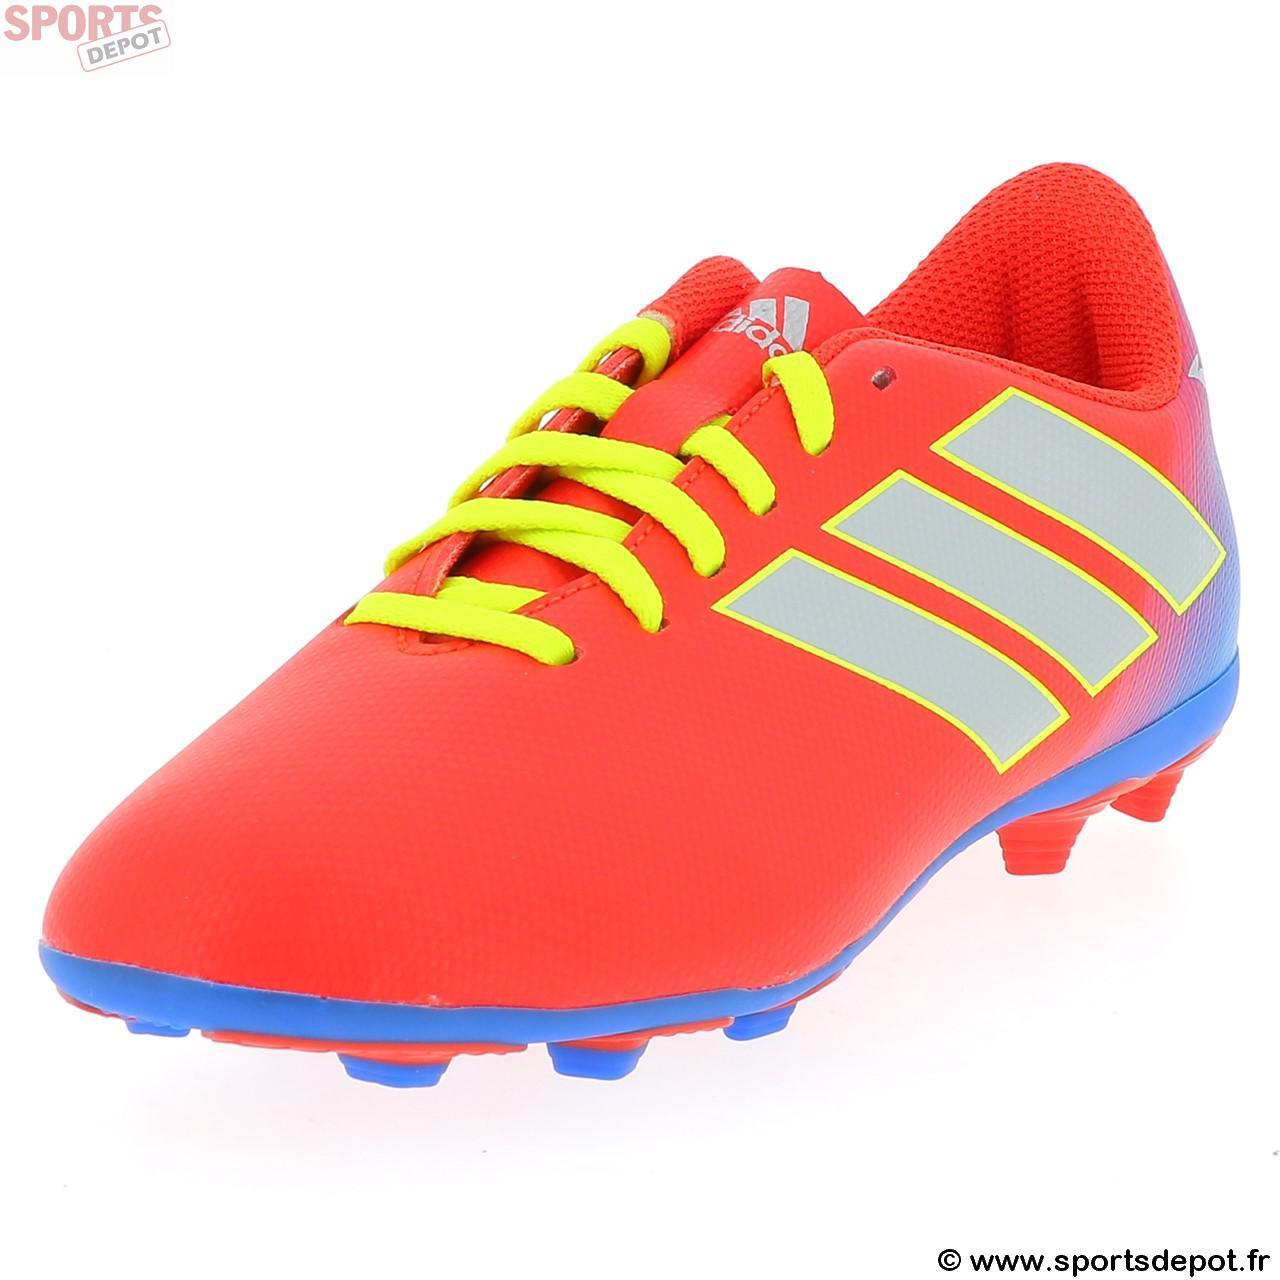 Lamelles 18 Messi Acheter Jr 4 Chaussures Fg Football Adidas Nemeziz yYfvb76g